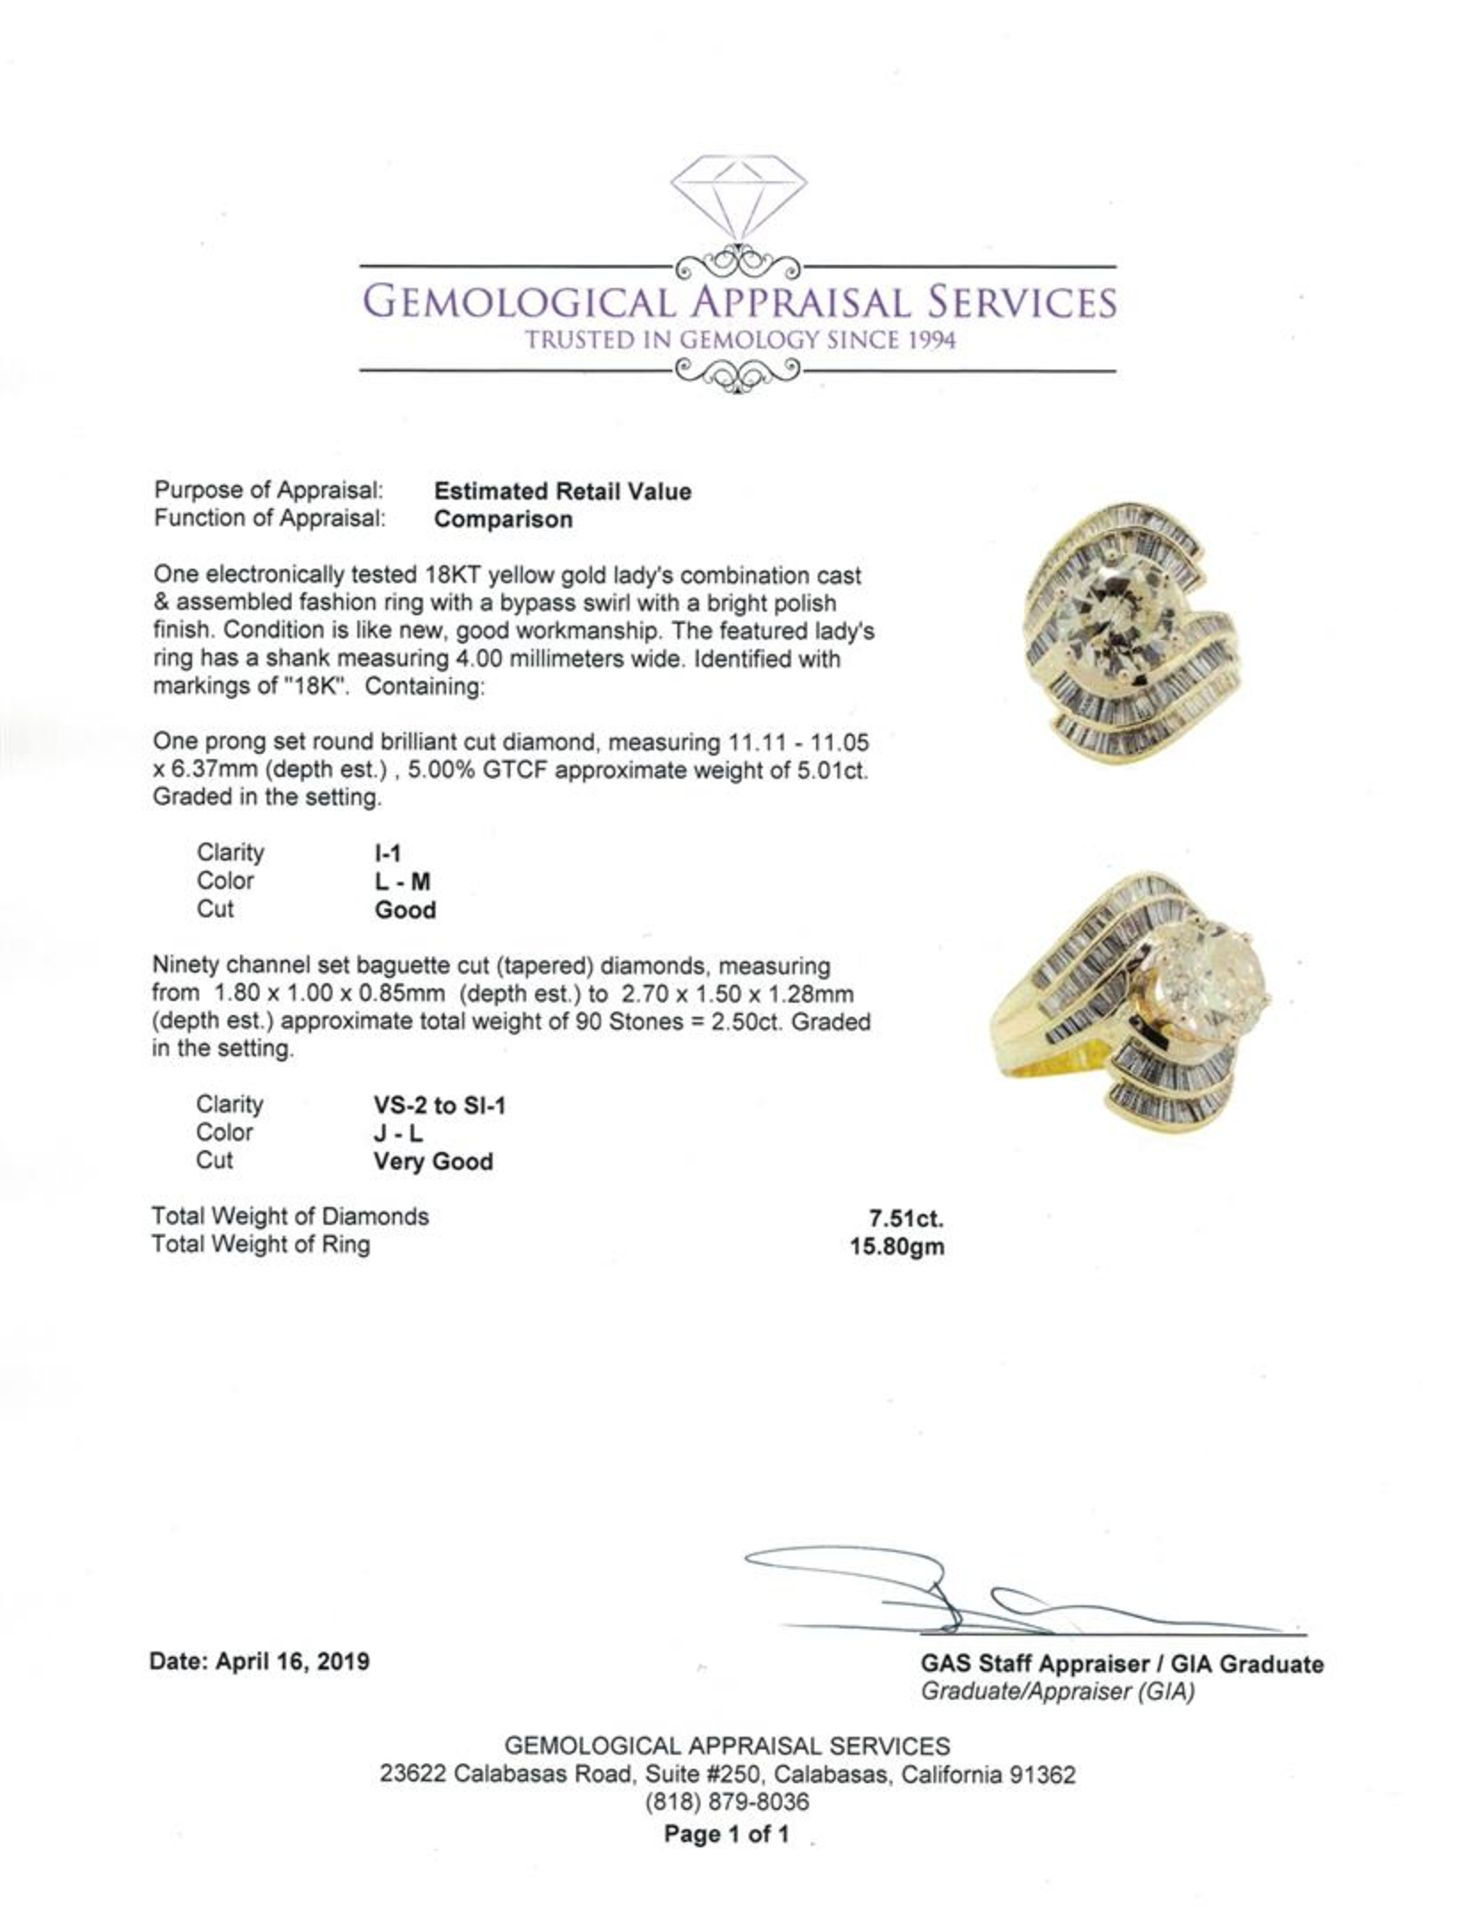 7.51 ctw Diamond Ring - 18KT Yellow Gold - Image 5 of 5